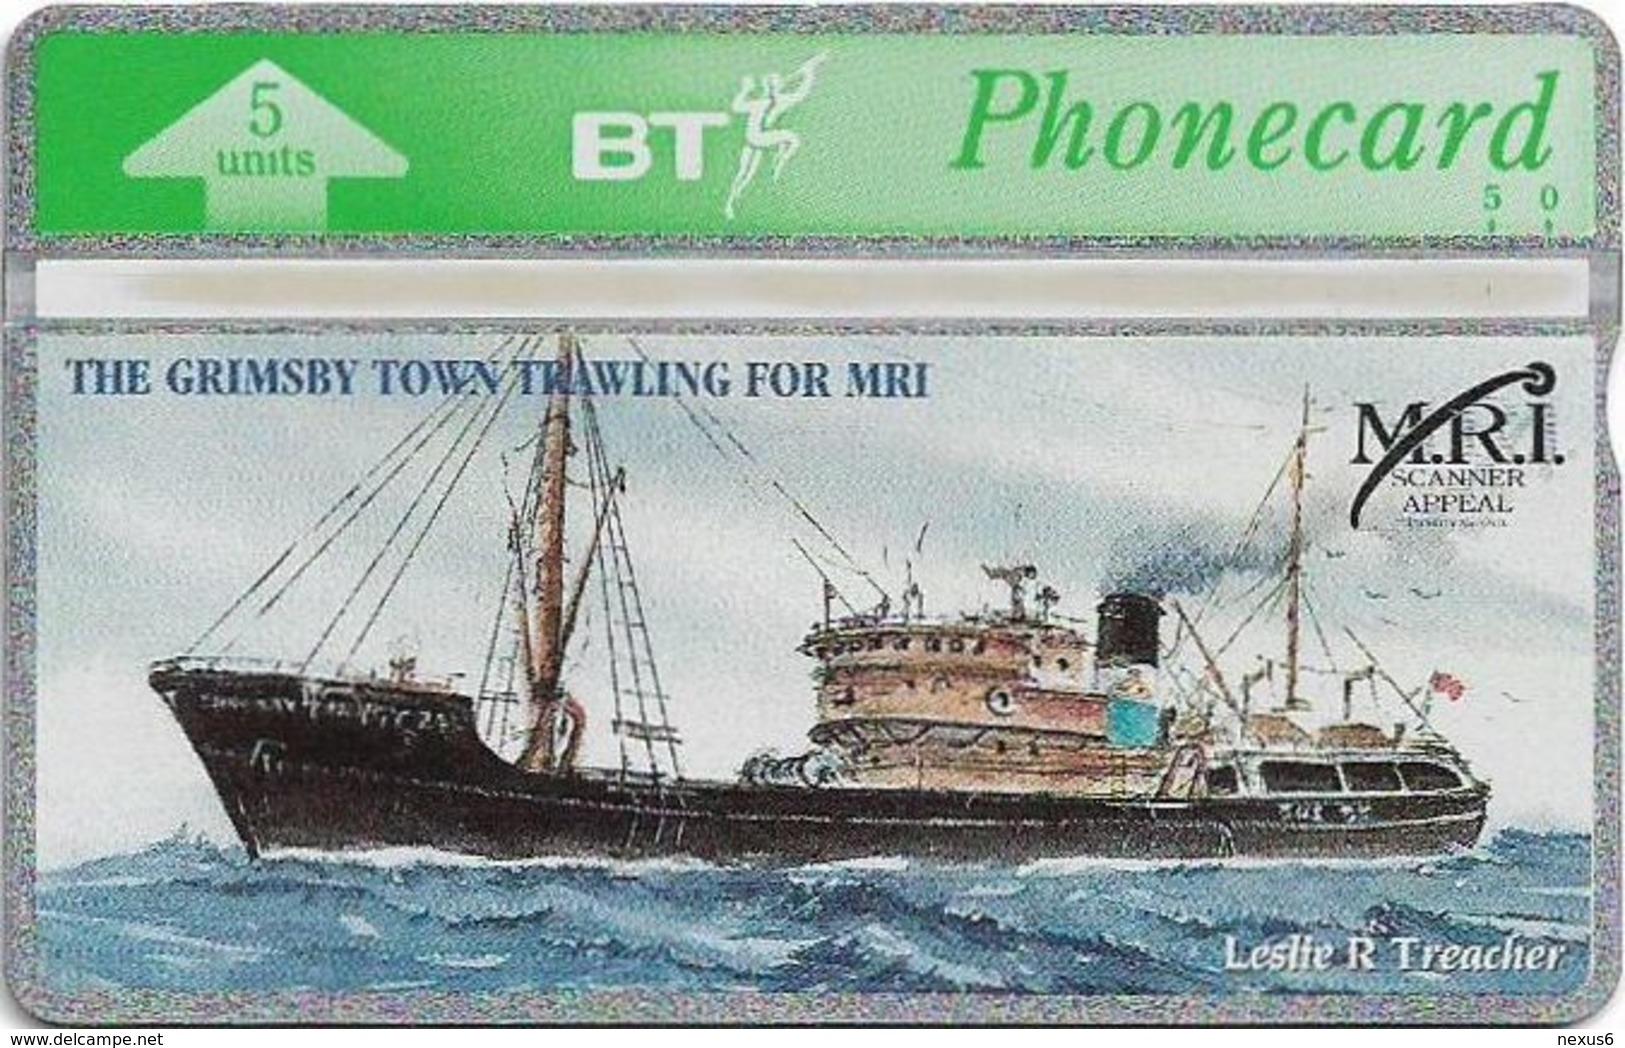 UK - BT - L&G - BTG-263 - MRI Scanner Appeal Grimsby Trawler - 403D - 5Units, 590ex, Mint - BT Edición General